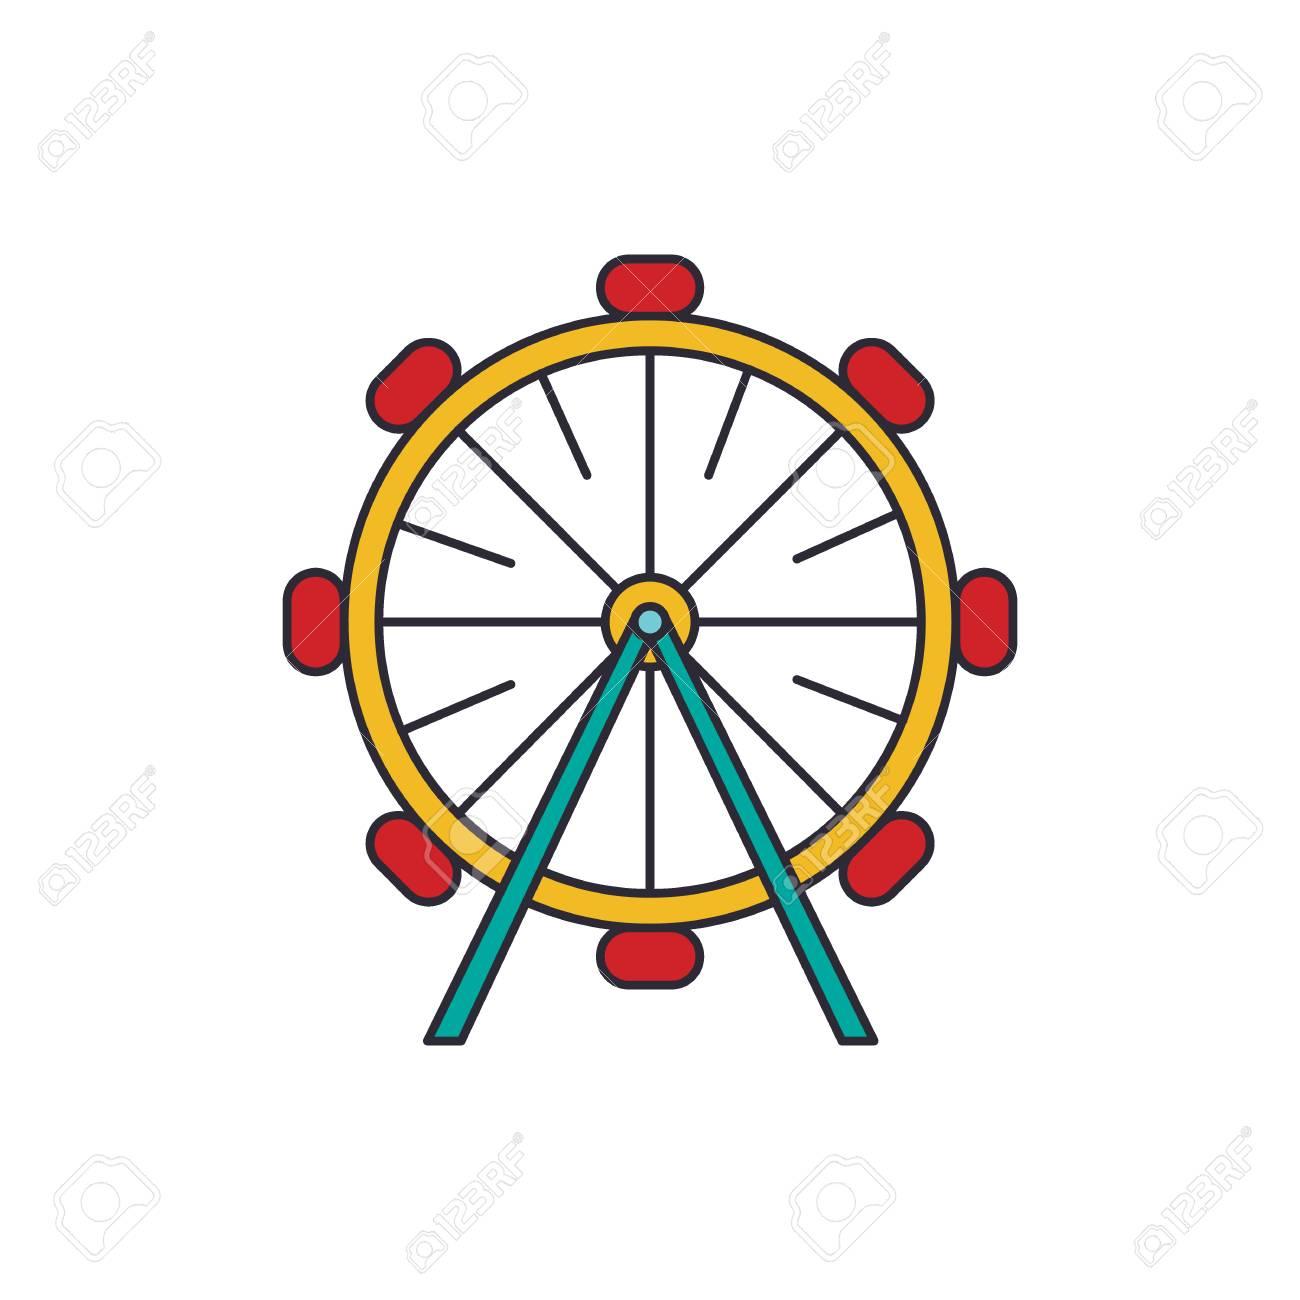 Ferris Wheel Icon Cartoon Ferris Wheel Vector Icon For Web Design Royalty Free Cliparts Vectors And Stock Illustration Image 108386807